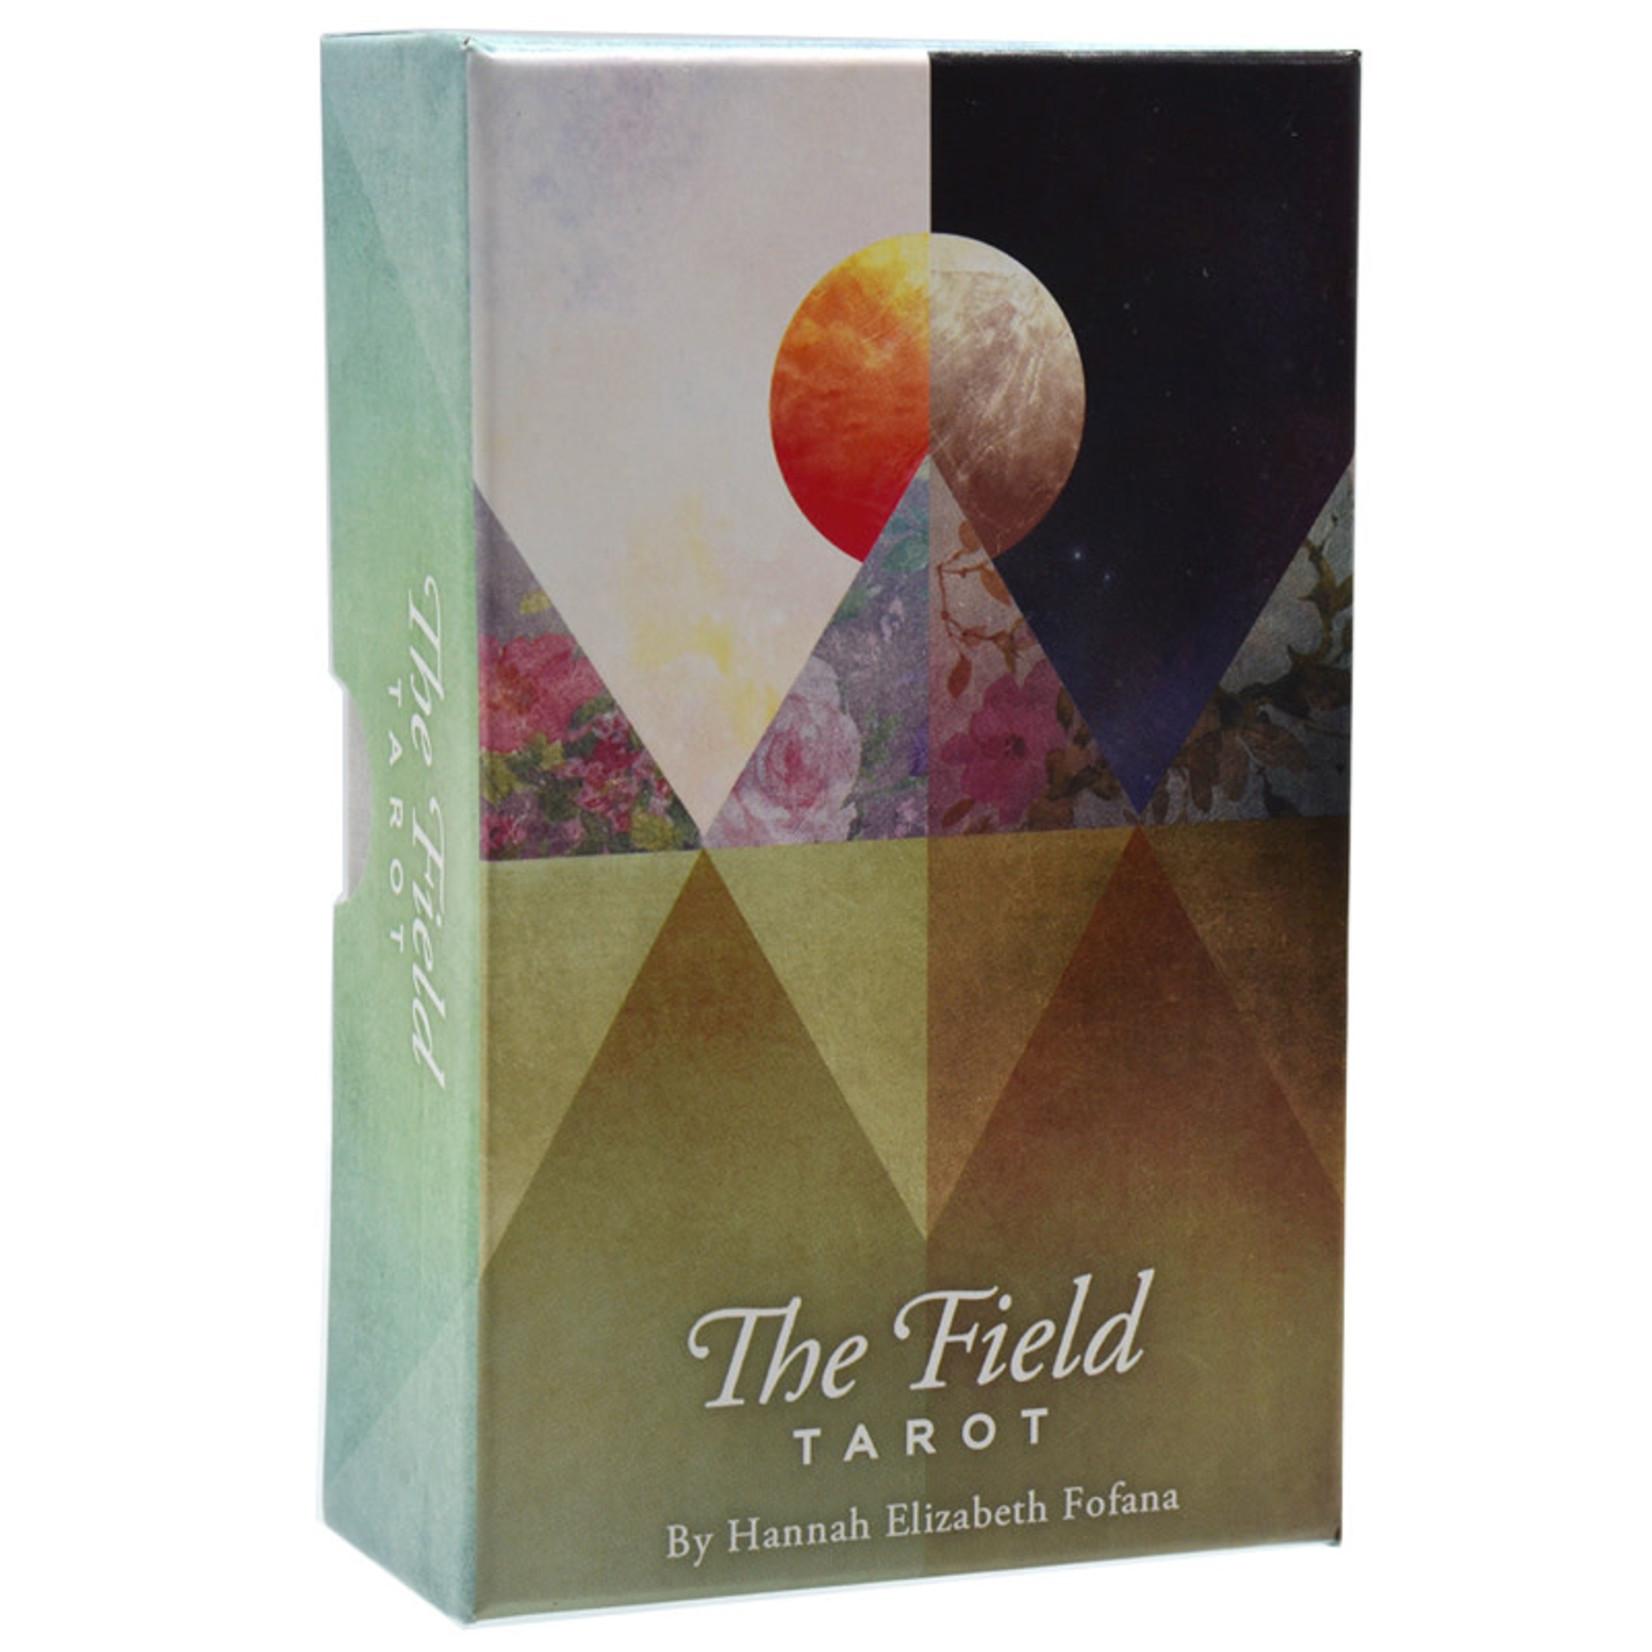 The Field Tarot